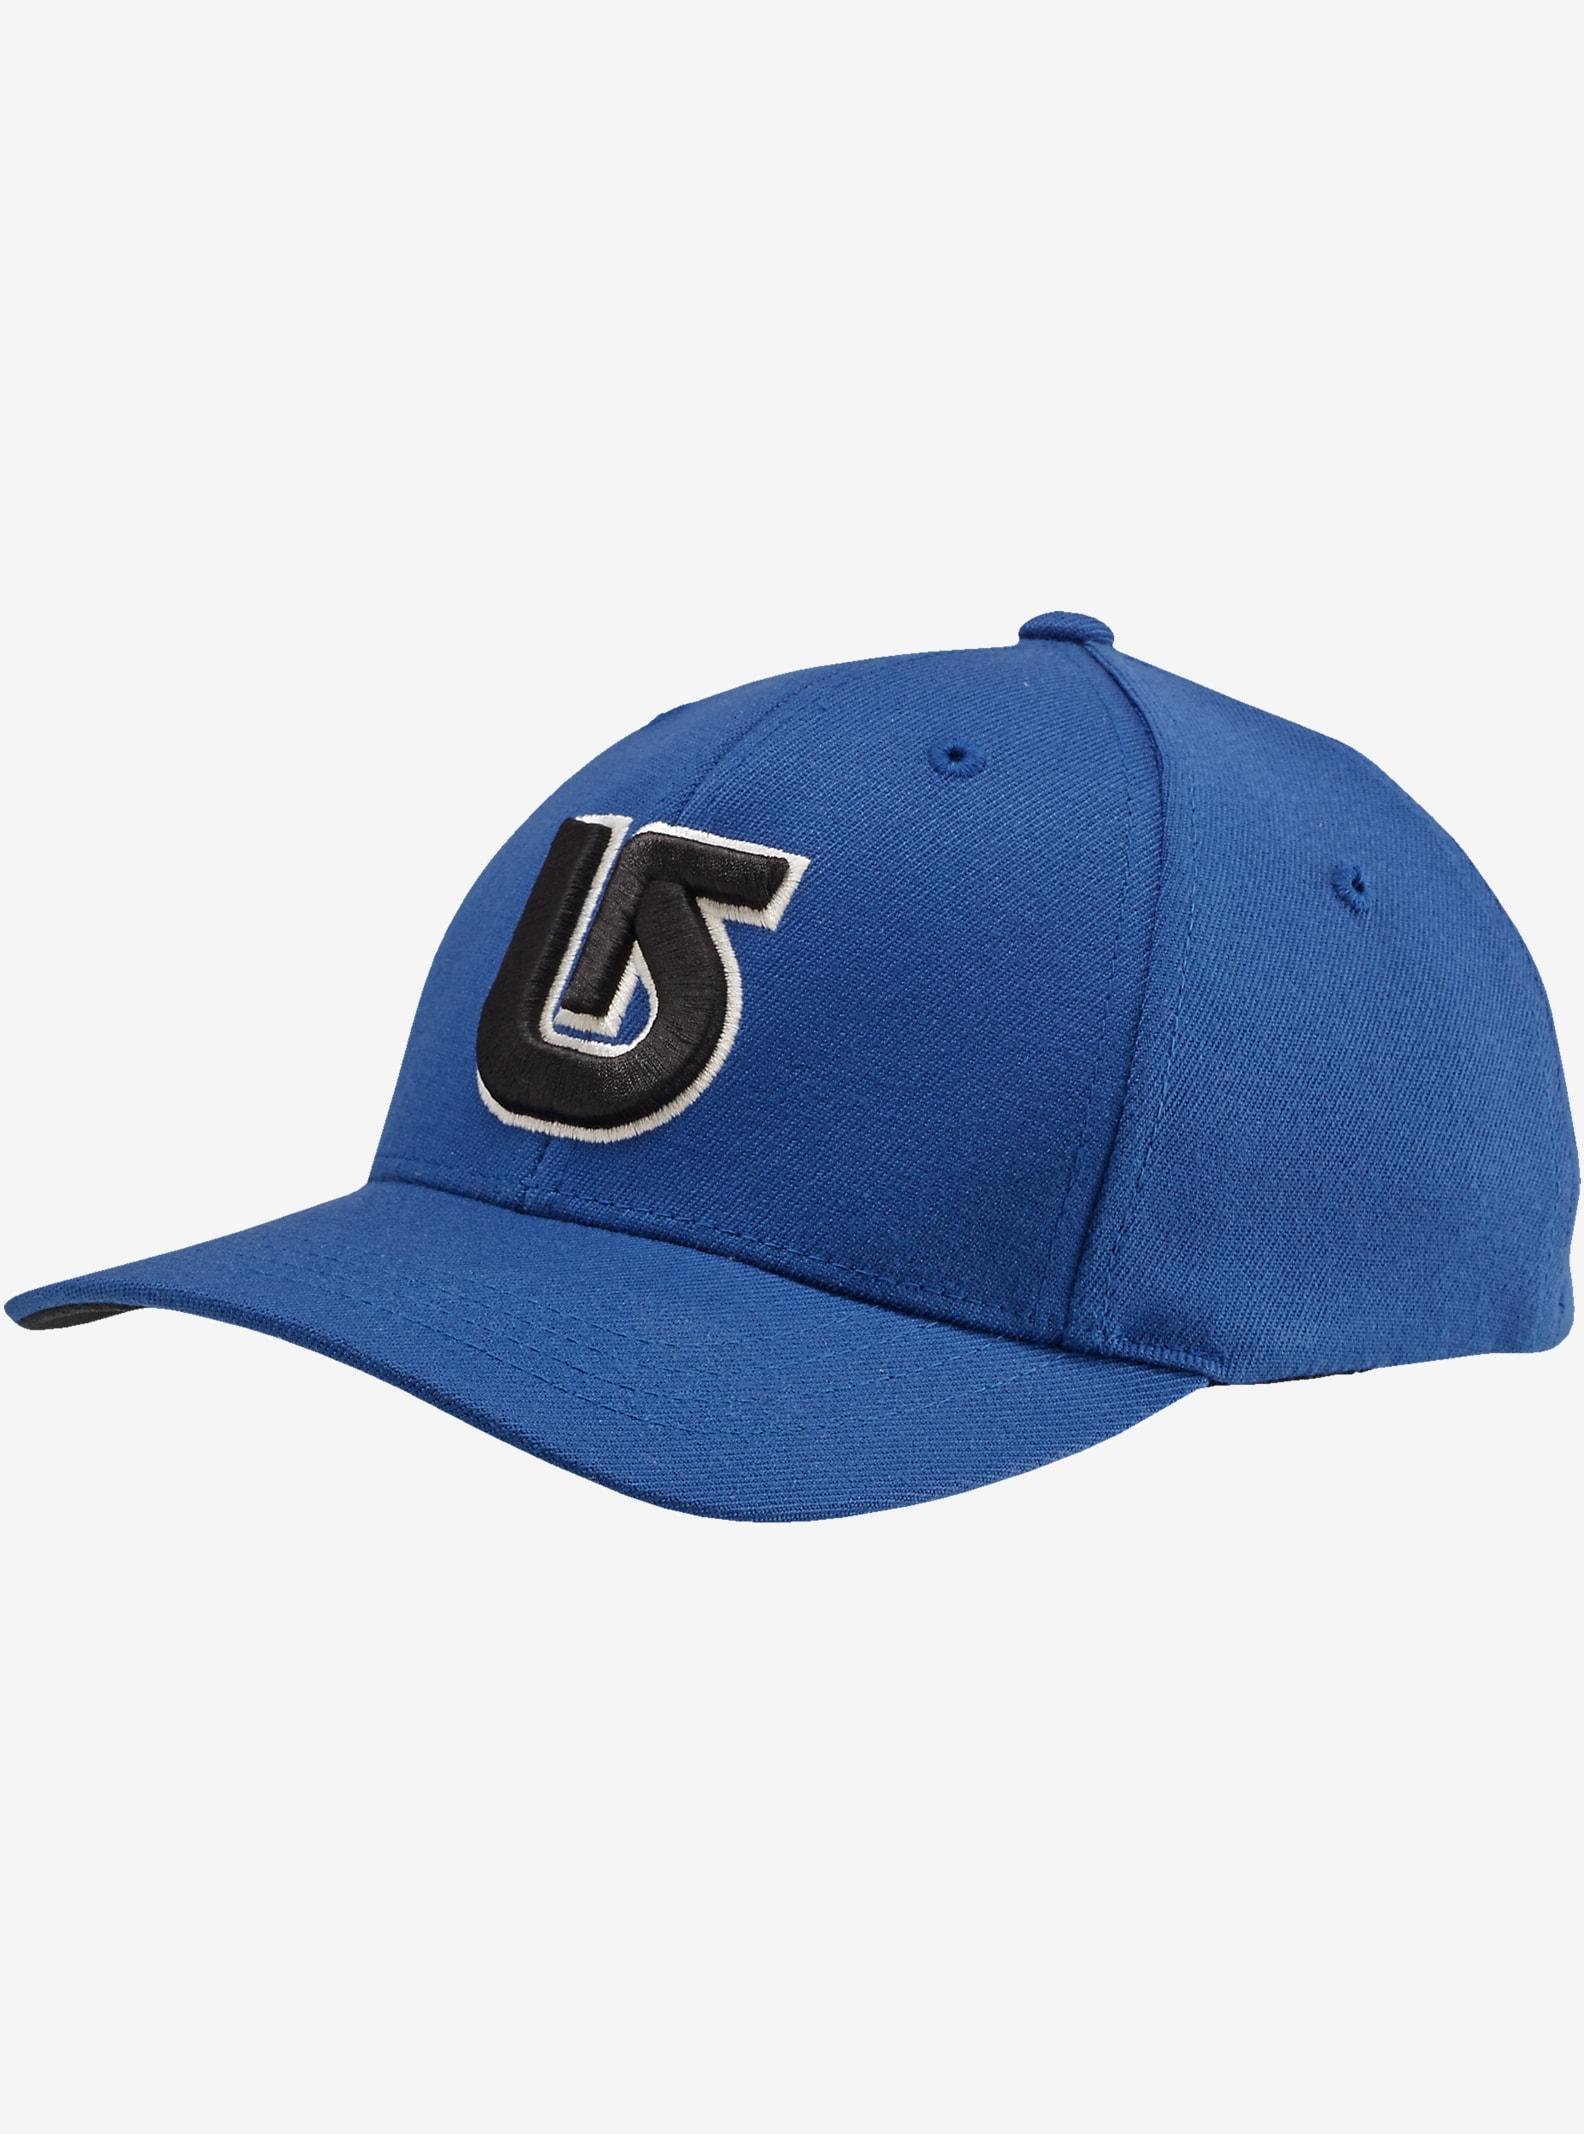 Burton Boys' Striker Flex Fit Hat shown in Web